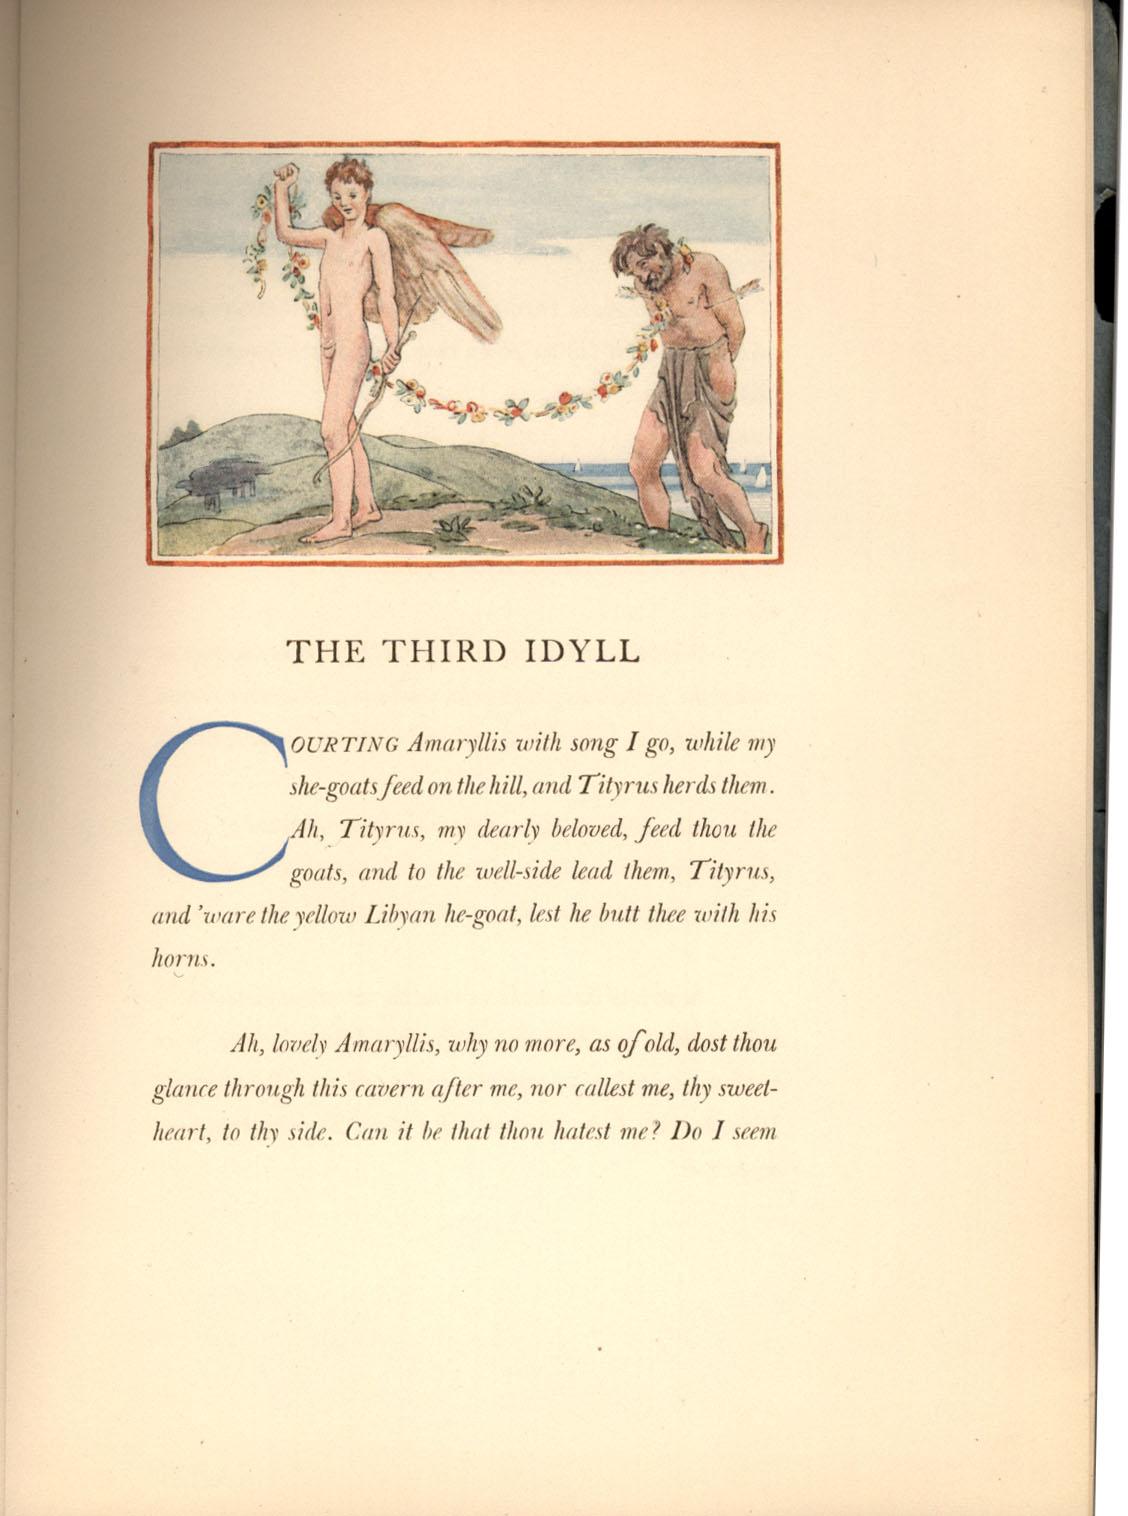 The Third Idyll of Theocritus